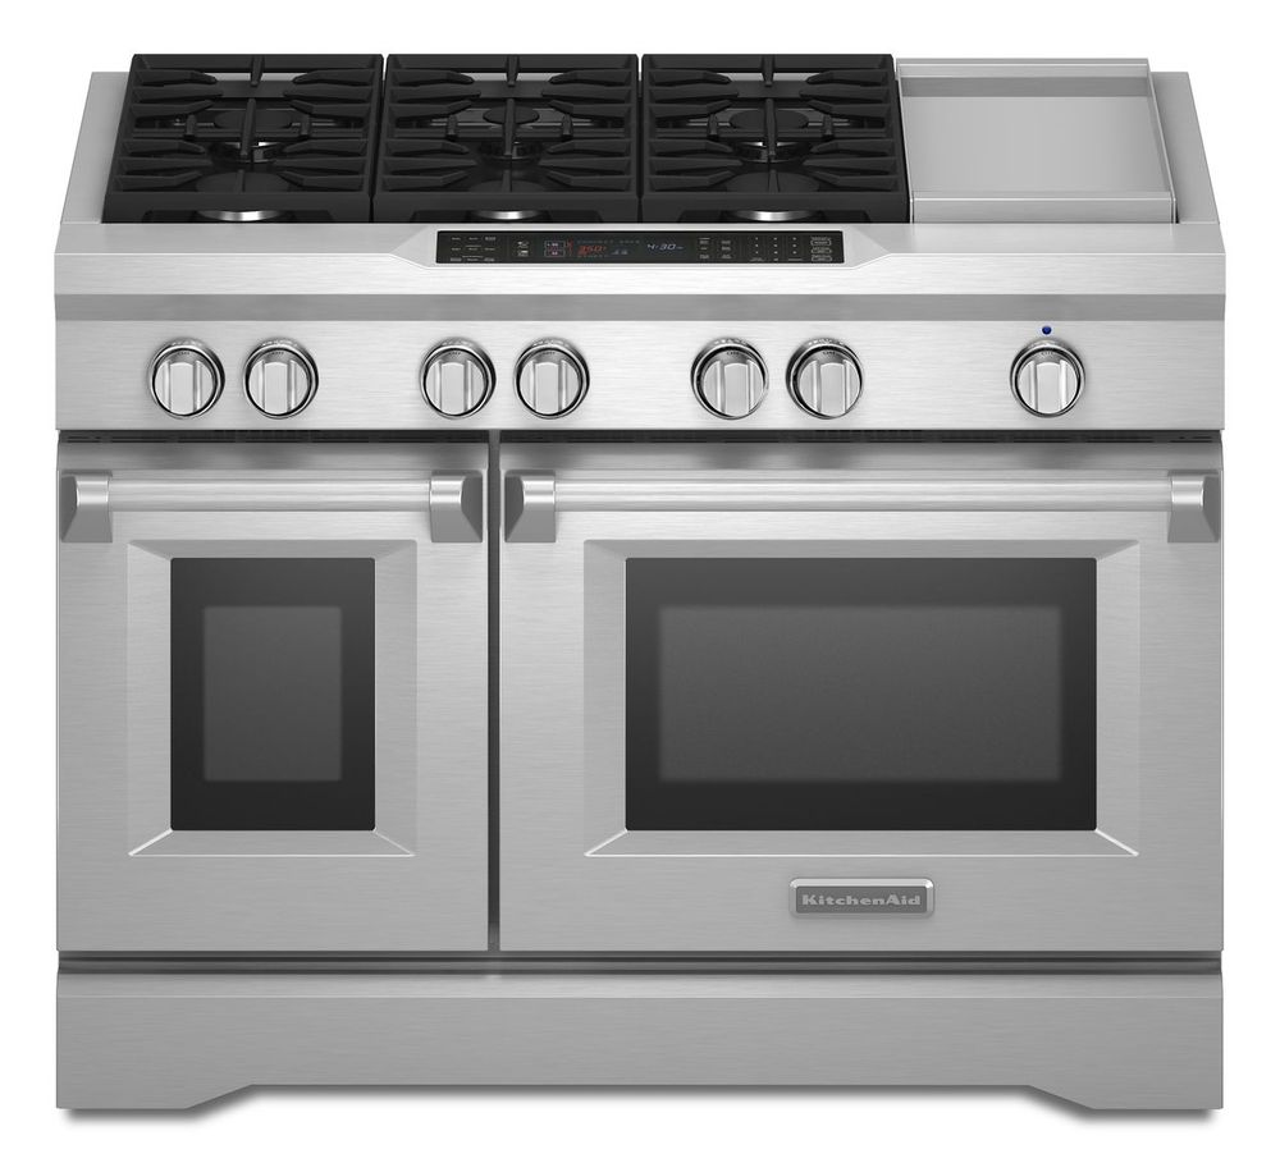 KitchenAid 6.3 Cu. Ft. Self-Cleaning Freestanding Double-Oven Dual Fuel Convection Range Silver KDRS483VSS